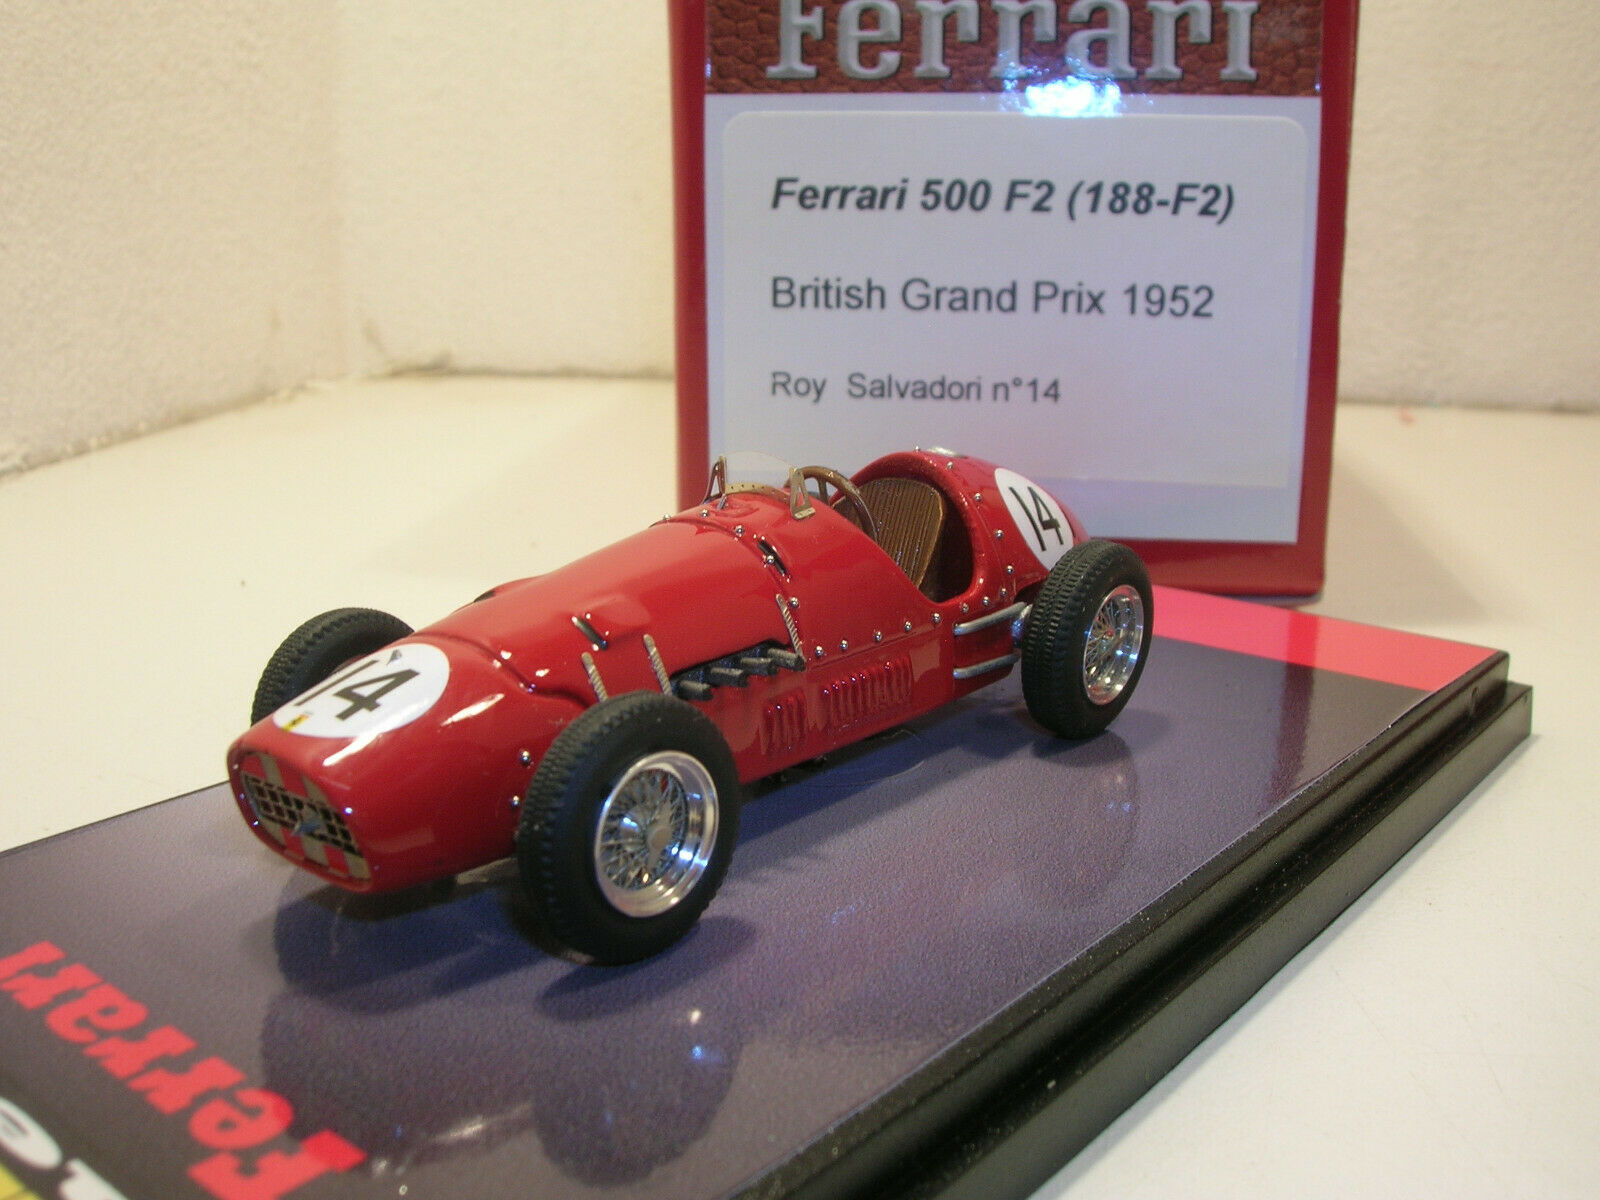 solo para ti Ferrari 500 F2  0188 British Gp 1952 1952 1952 n AMR BBR  encuentra tu favorito aquí